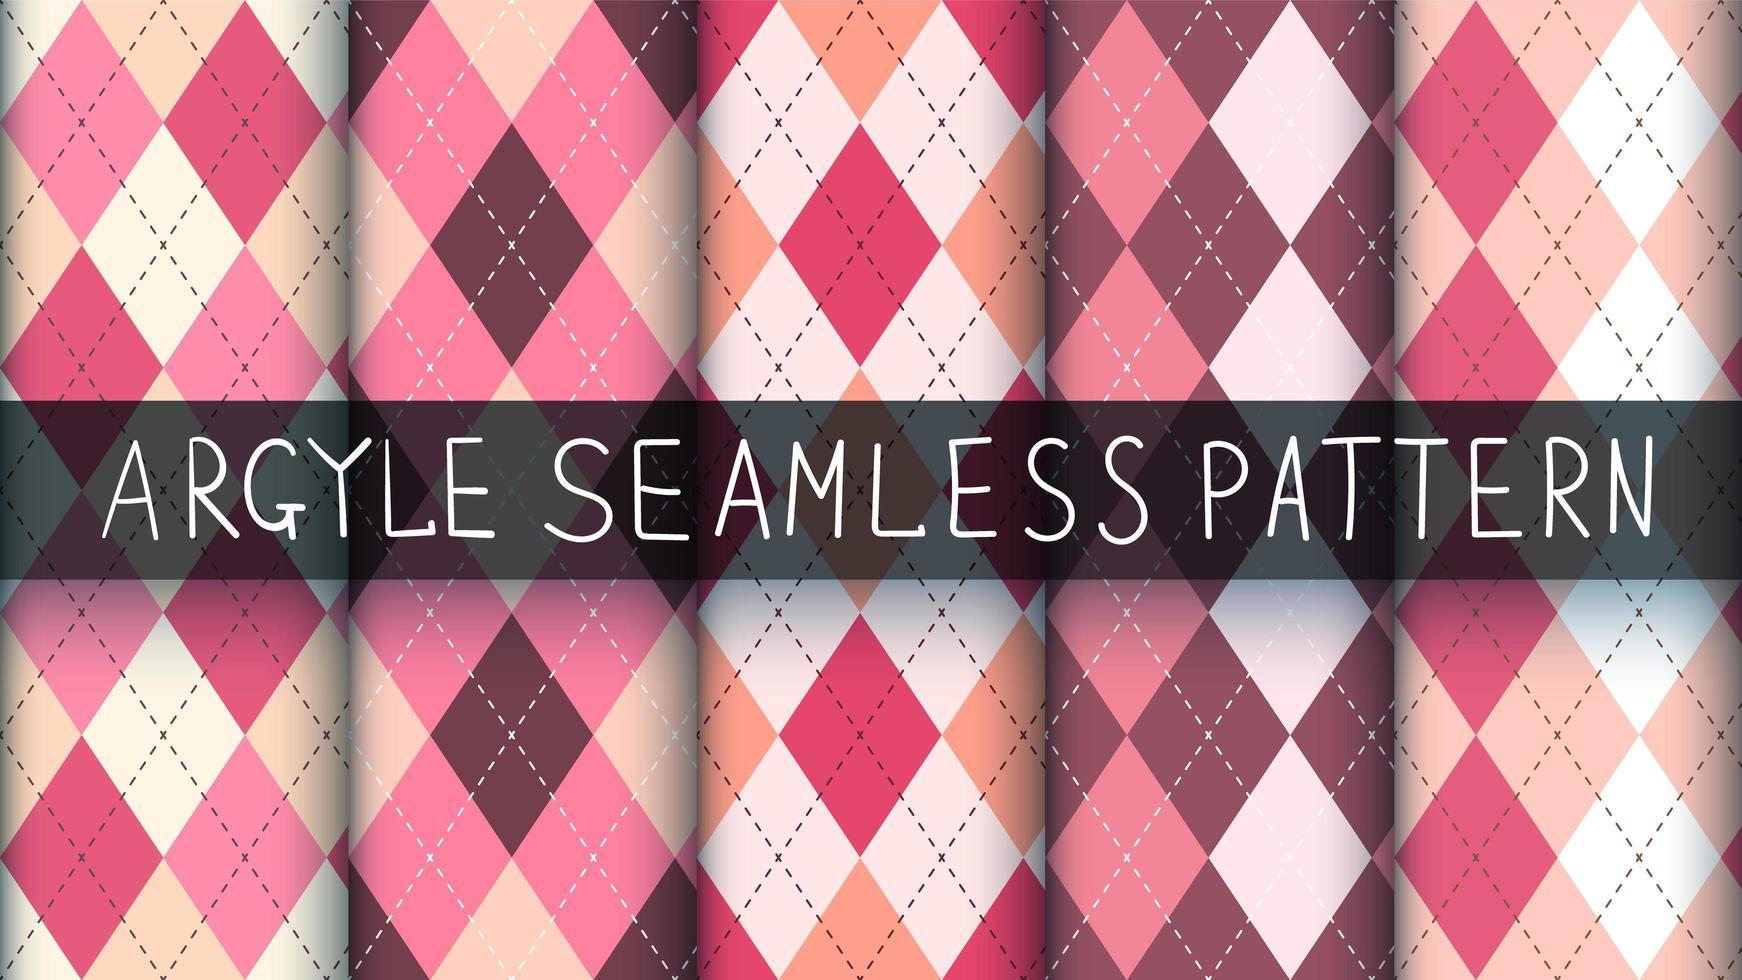 conjunto sem costura tartan, argyle e xadrez rosa vetor